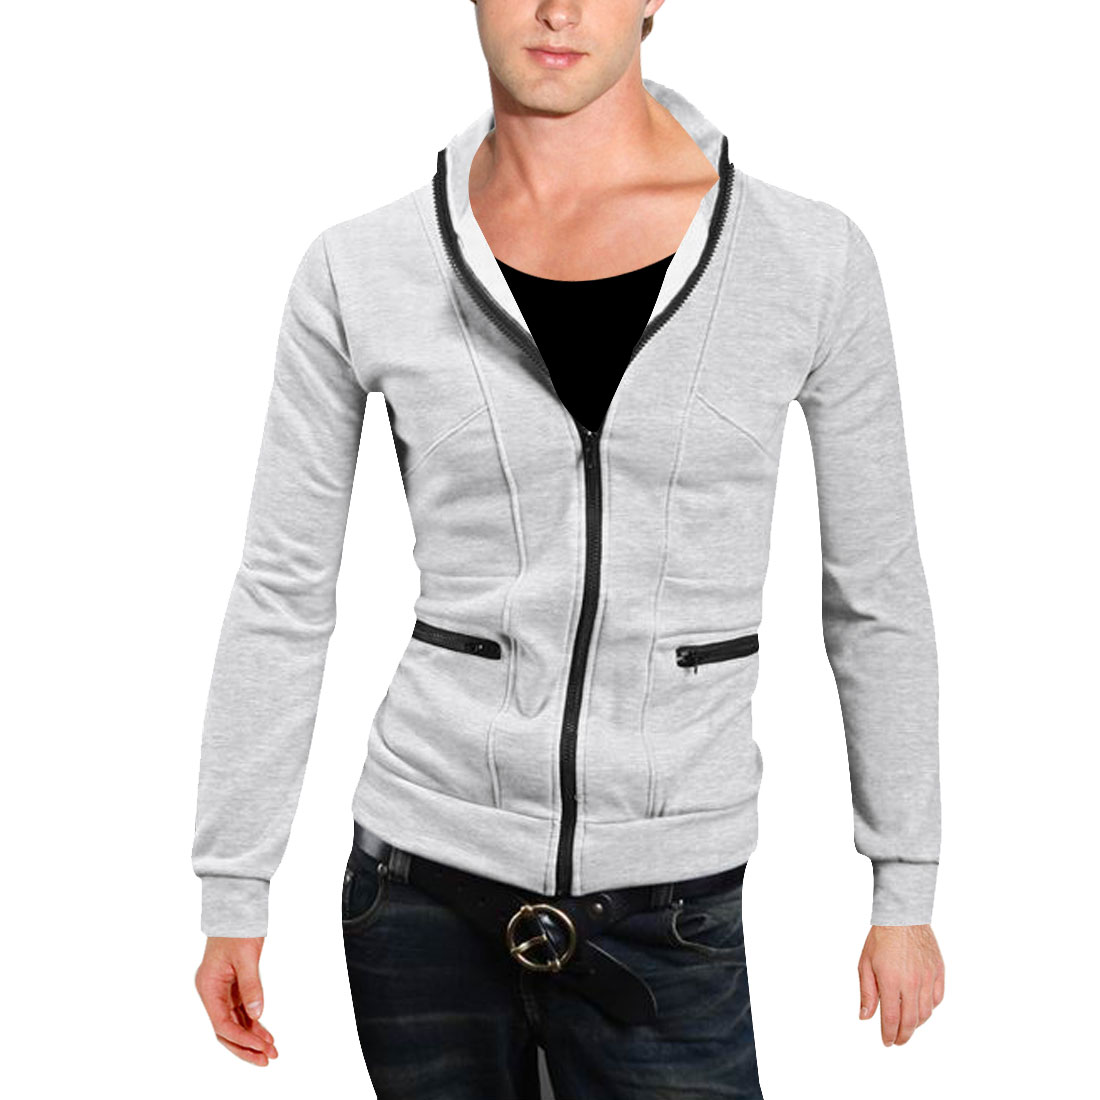 Azzuro Men's Zipper Pockets Chic Stylish Long Sleeve Thic...